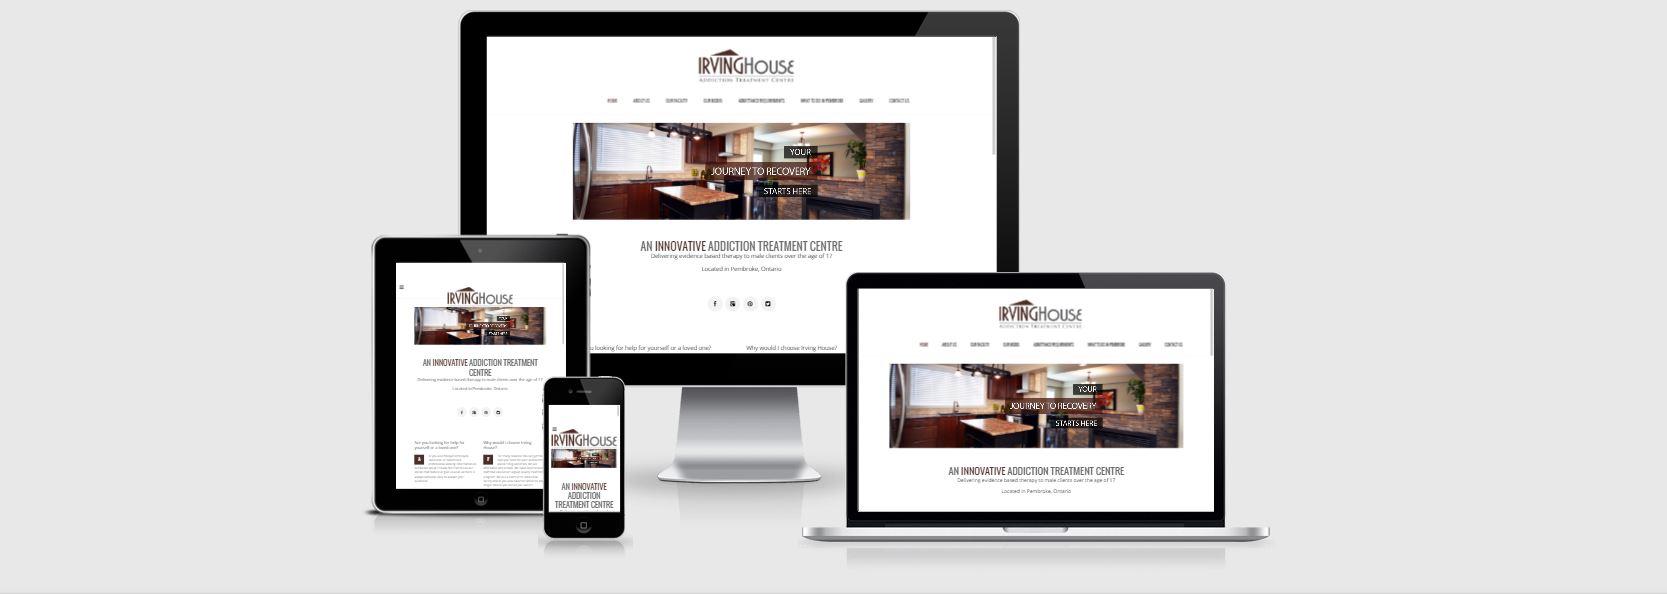 website-design-responsive design-2